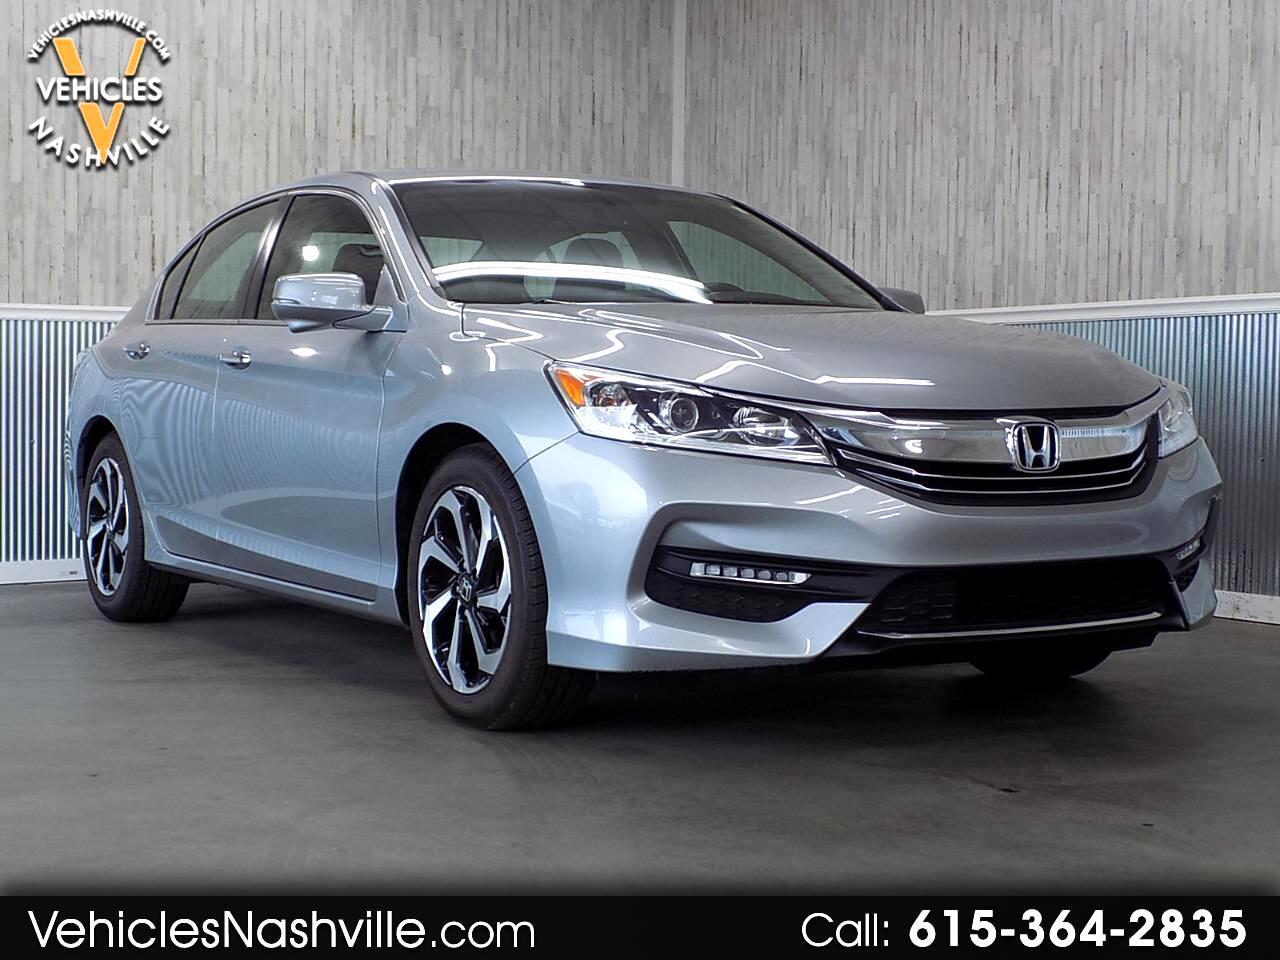 2017 Honda Accord EX-L Sedan CVT